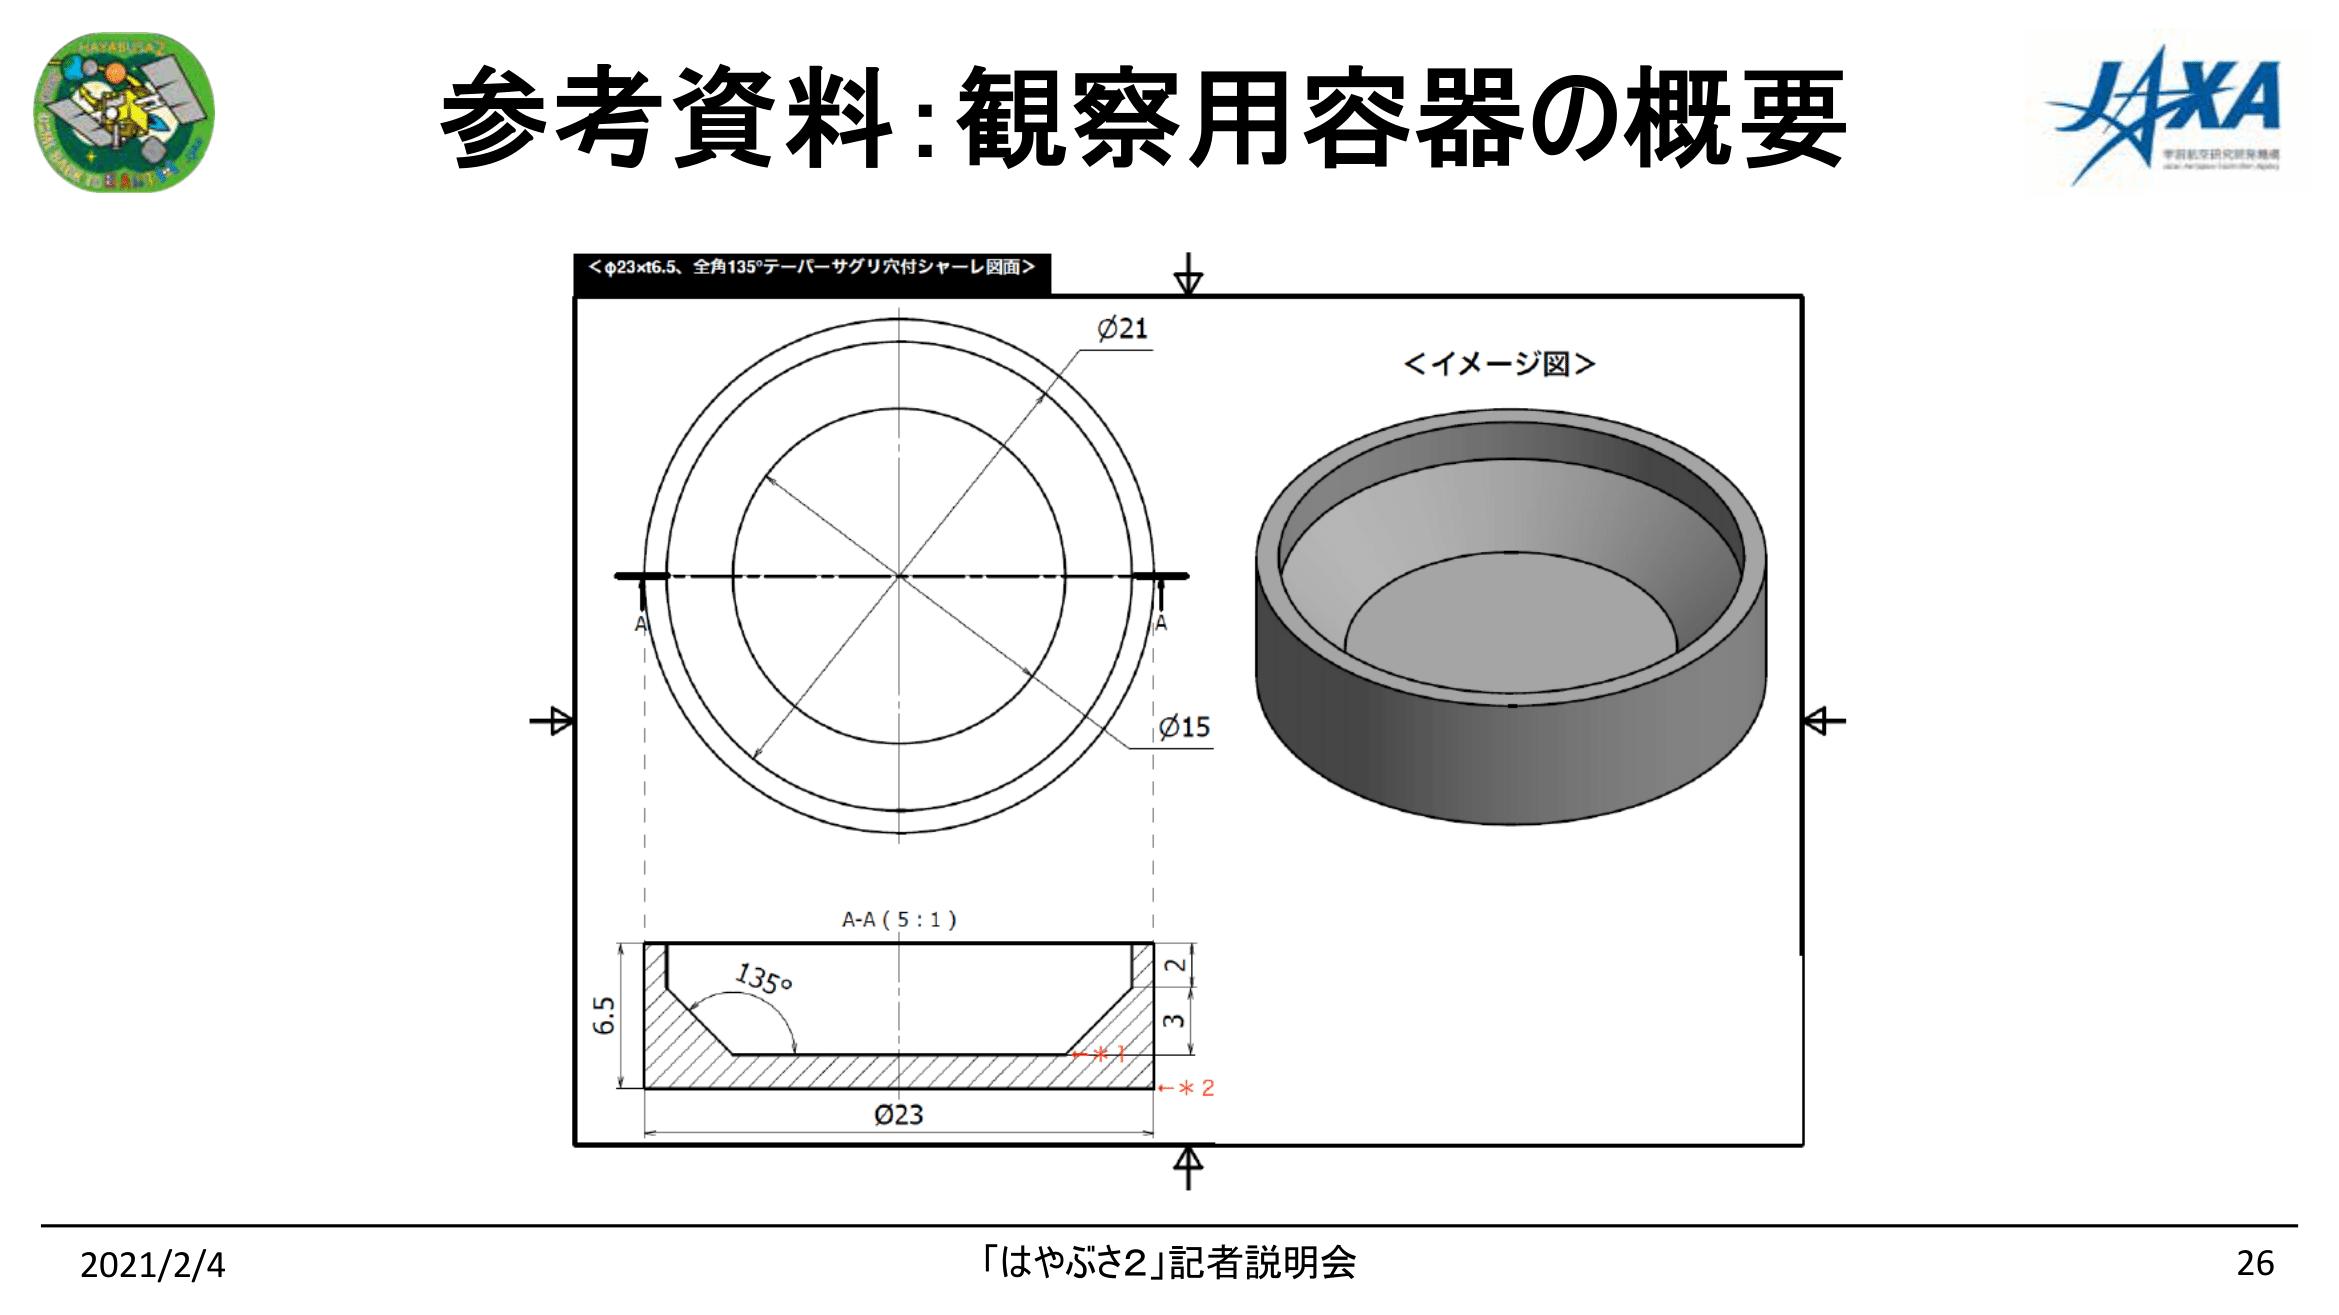 f:id:Imamura:20210204134542p:plain